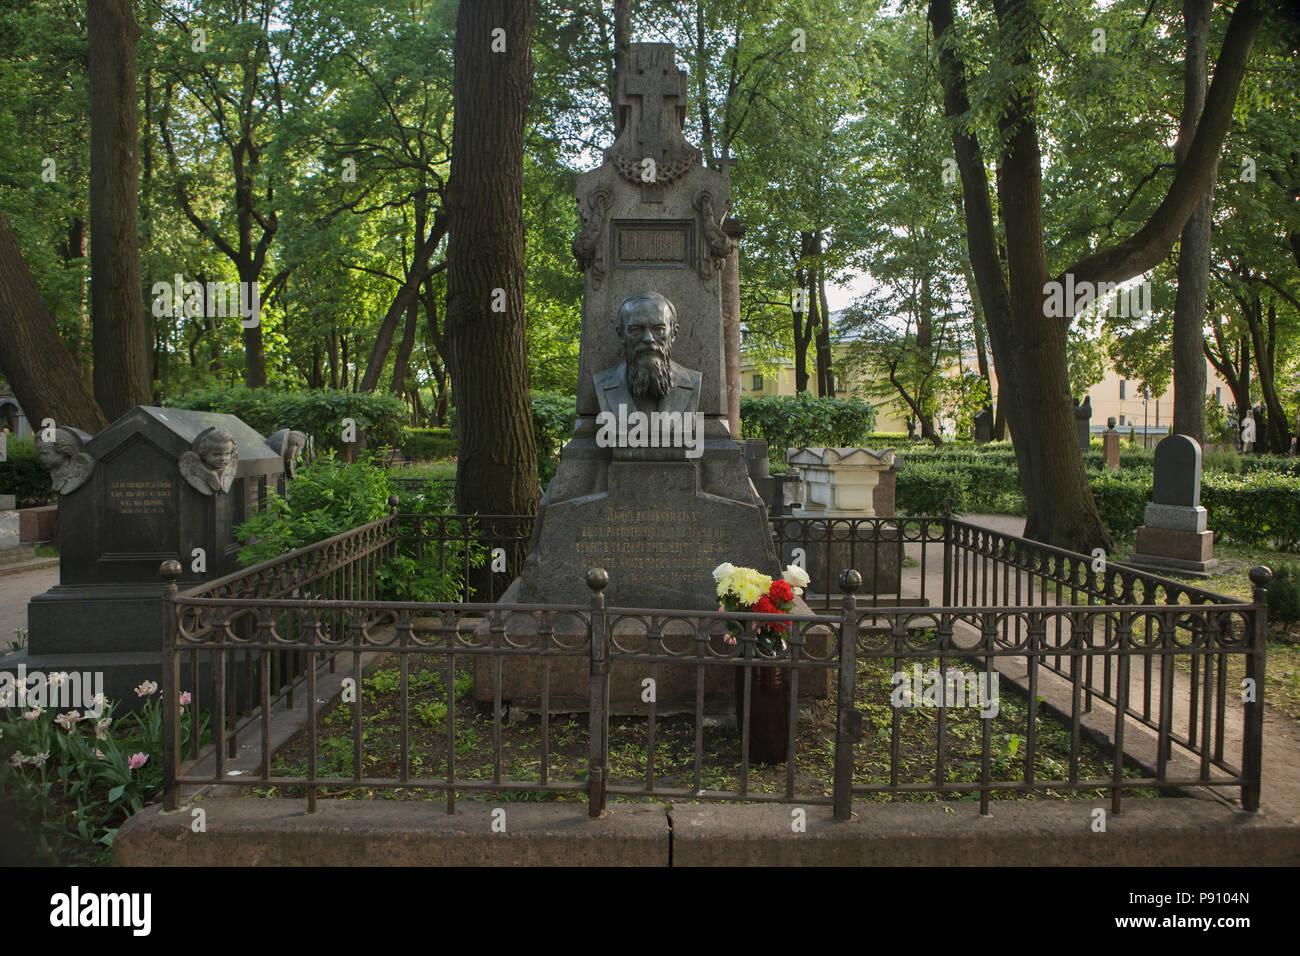 Grave of Russian novelist Fyodor Dostoevsky at Tikhvinskoye Cemetery of the Alexander Nevsky Monastery in Saint Petersburg, Russia. - Stock Image